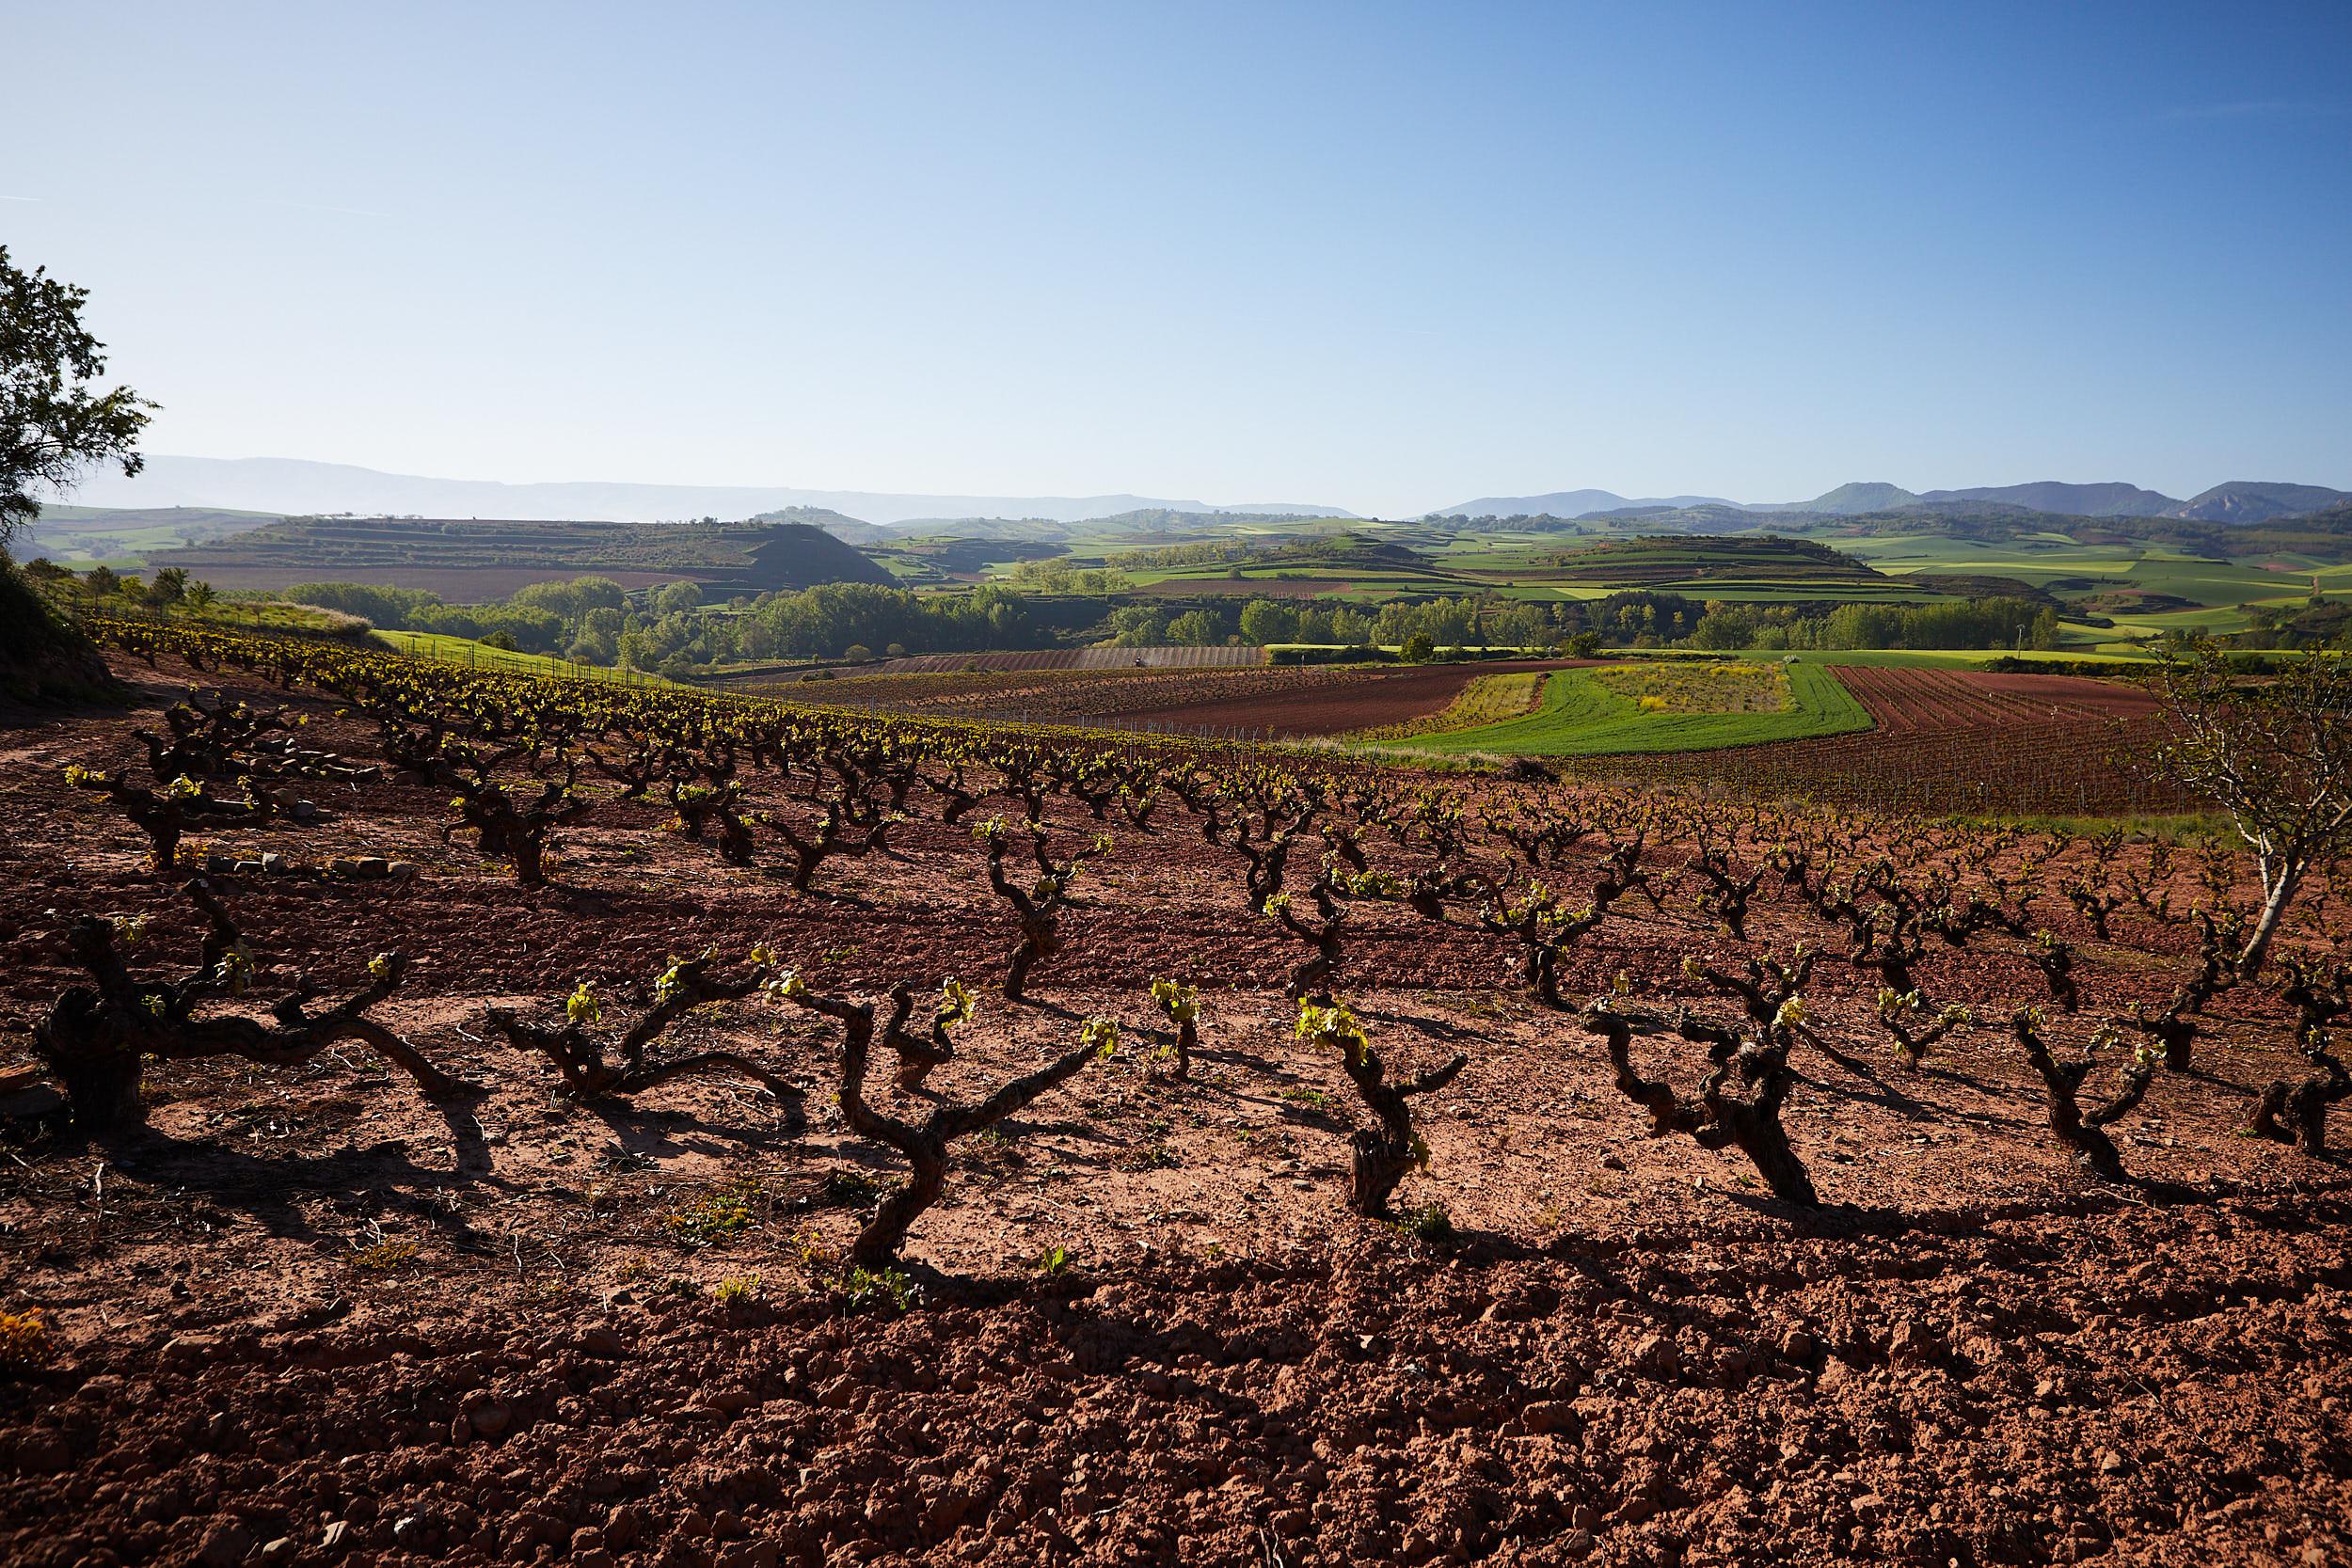 1805Commercial-professional-wine-photography-la-rioja-spain-James-Sturcke_0015.jpg